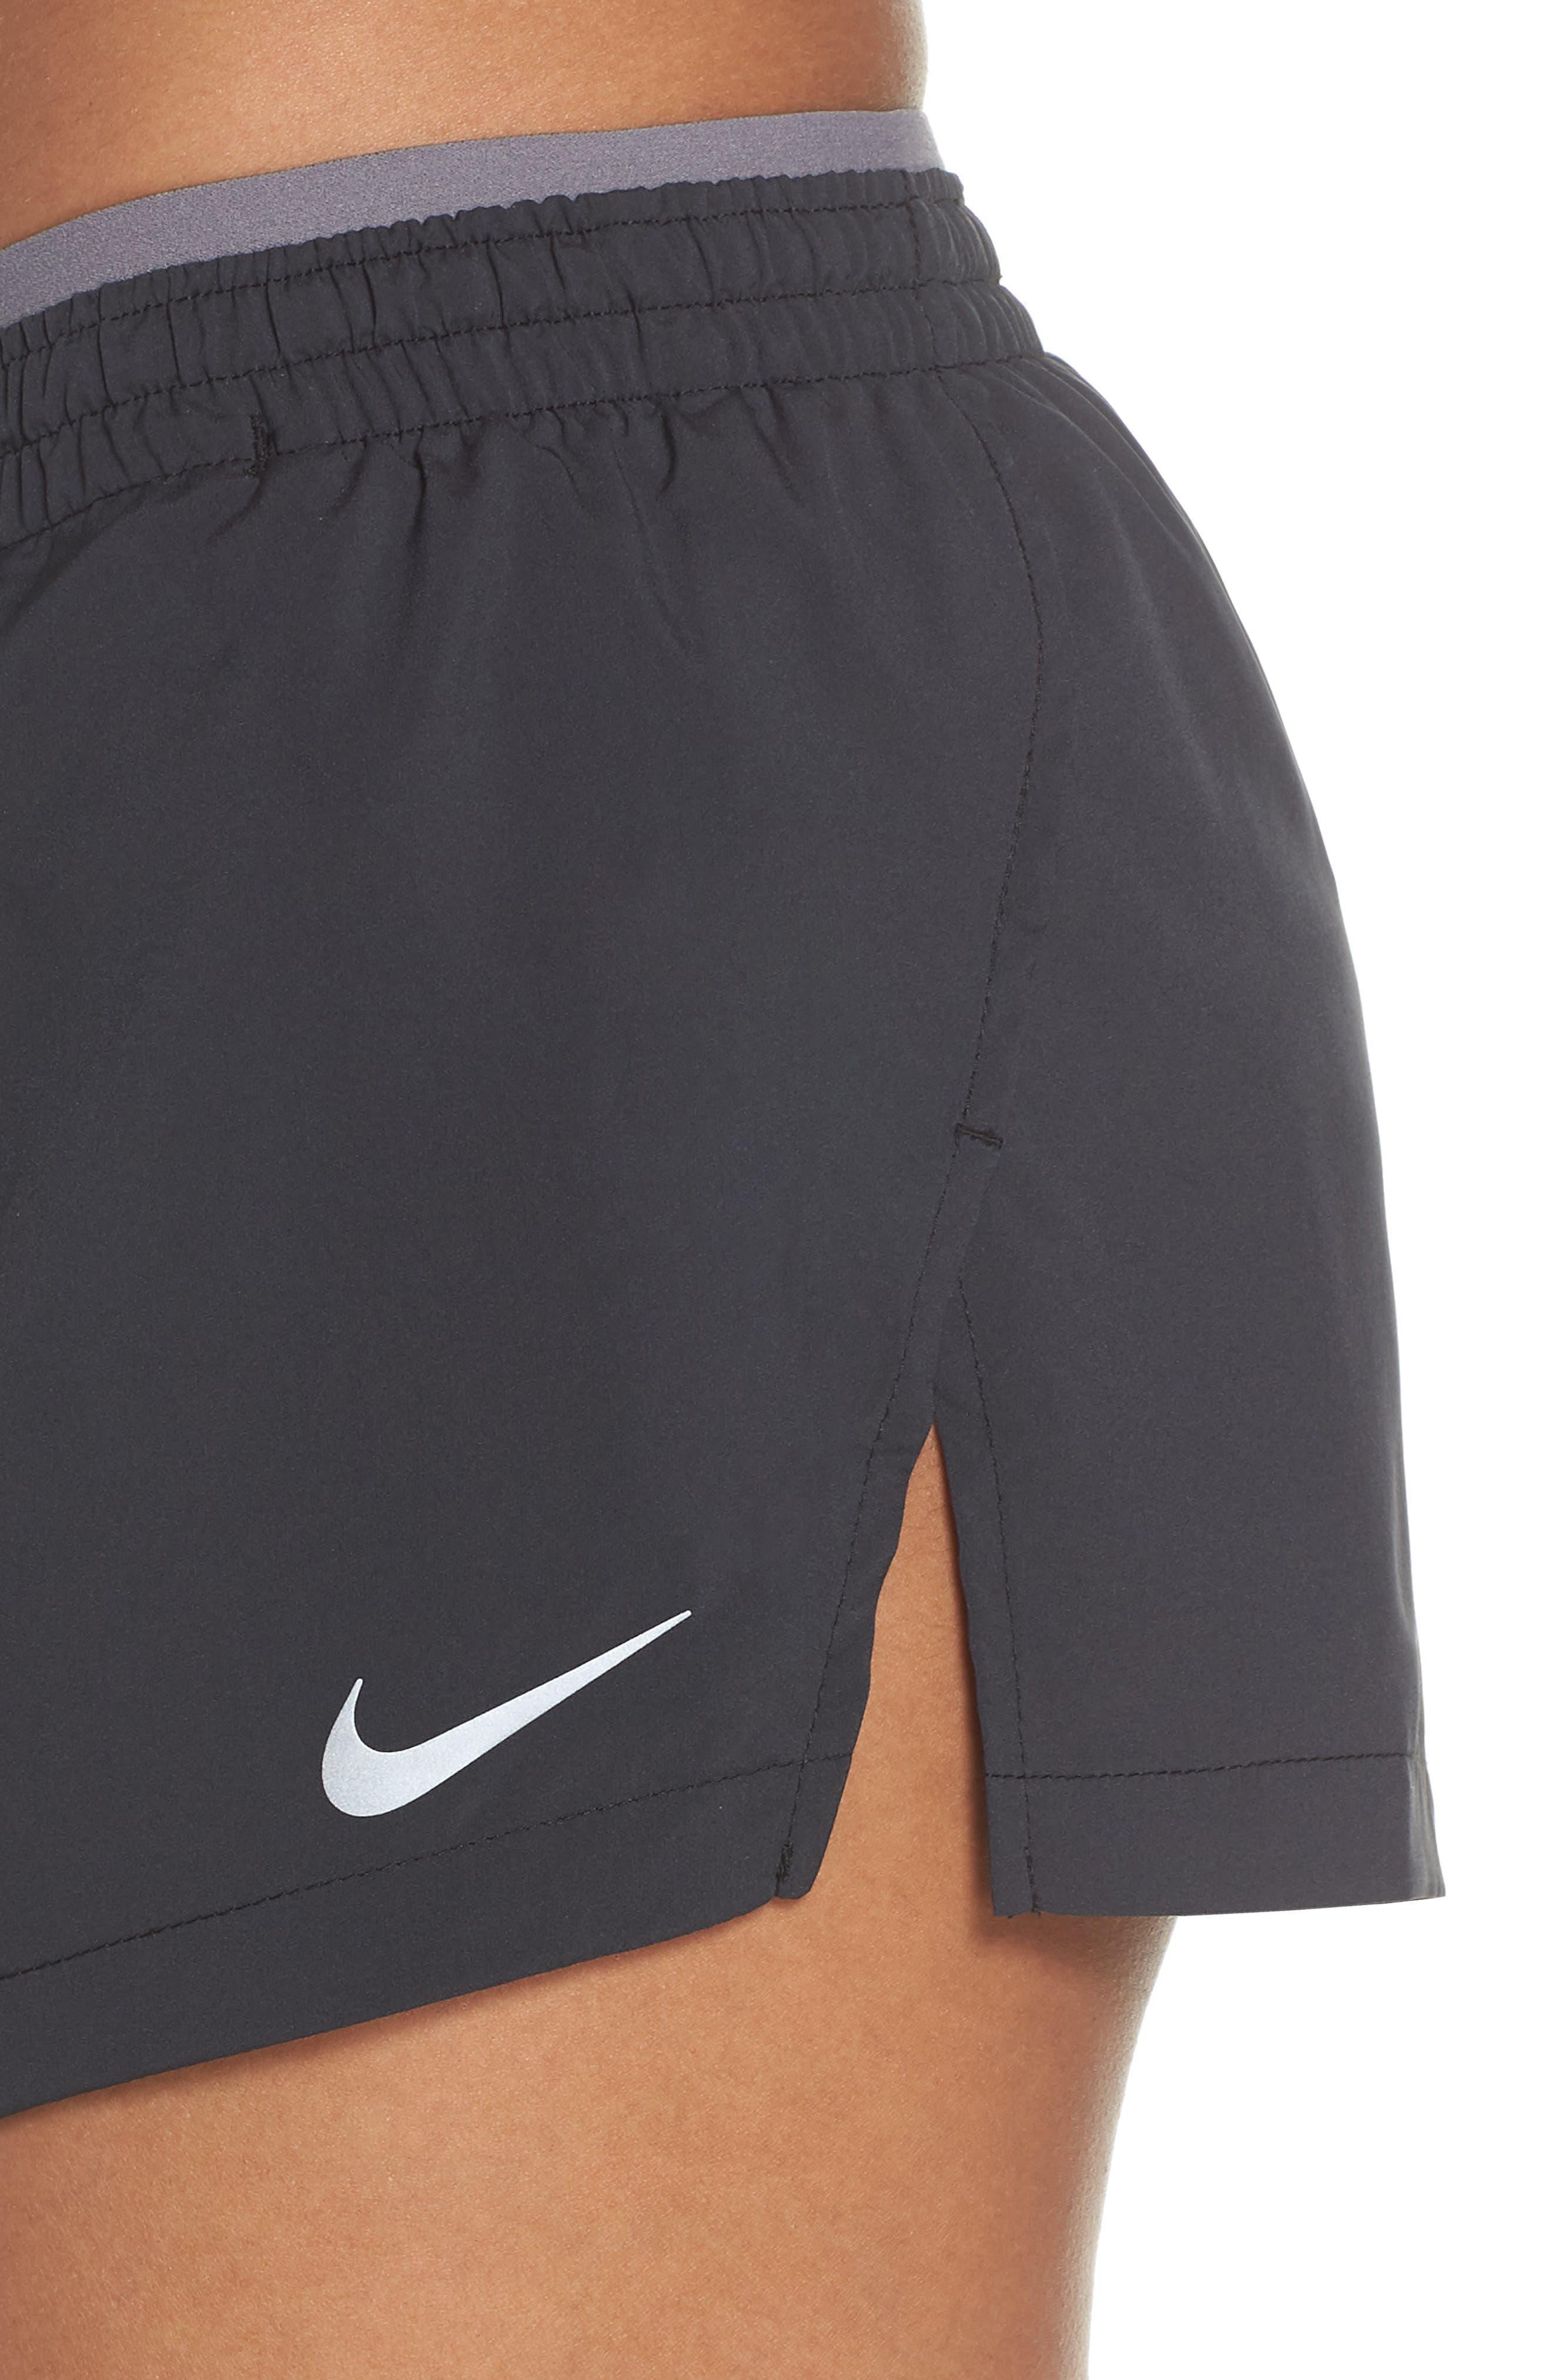 Flex Running Shorts,                             Alternate thumbnail 4, color,                             Black/ Gunsmoke